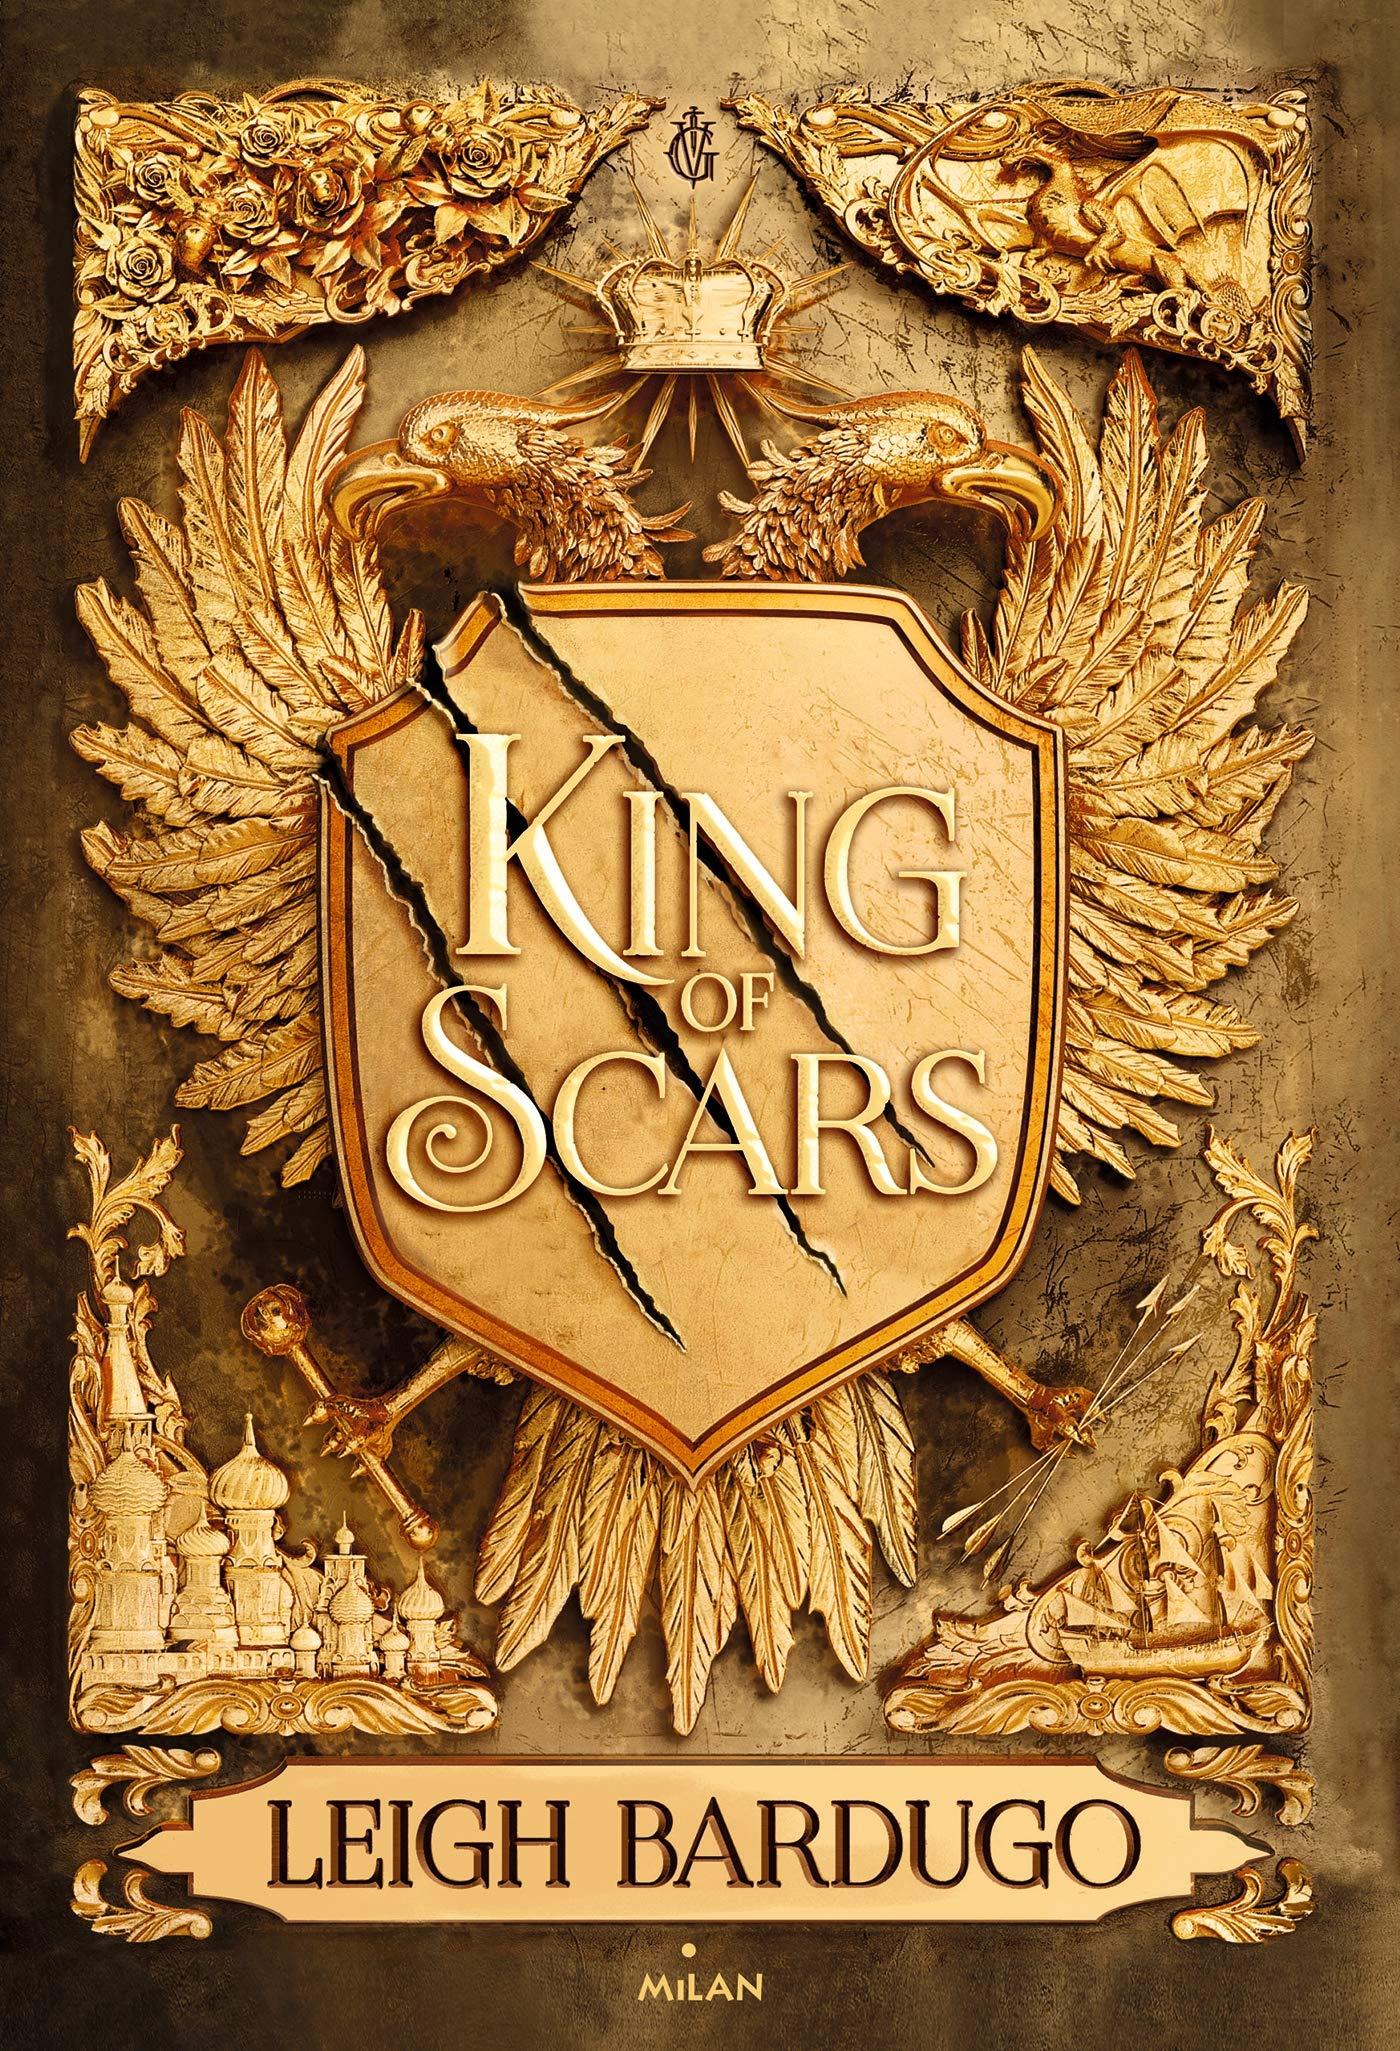 King of scars – Tome 1 écrit par Leigh Bardugo